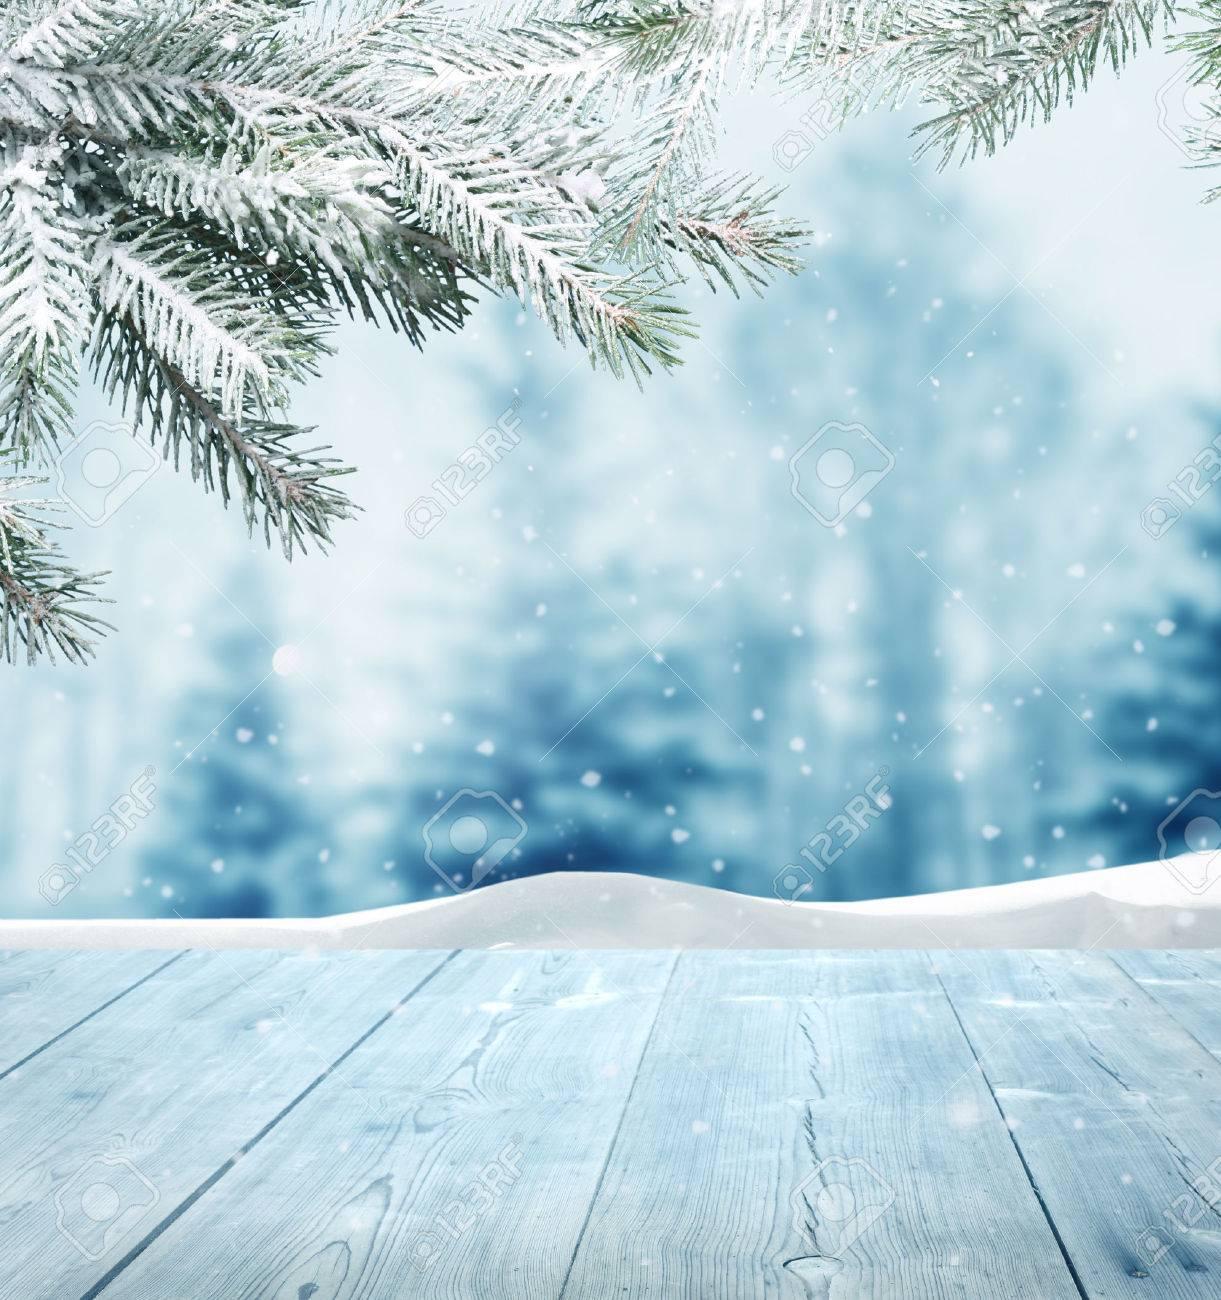 winter background Stock Photo - 23860808